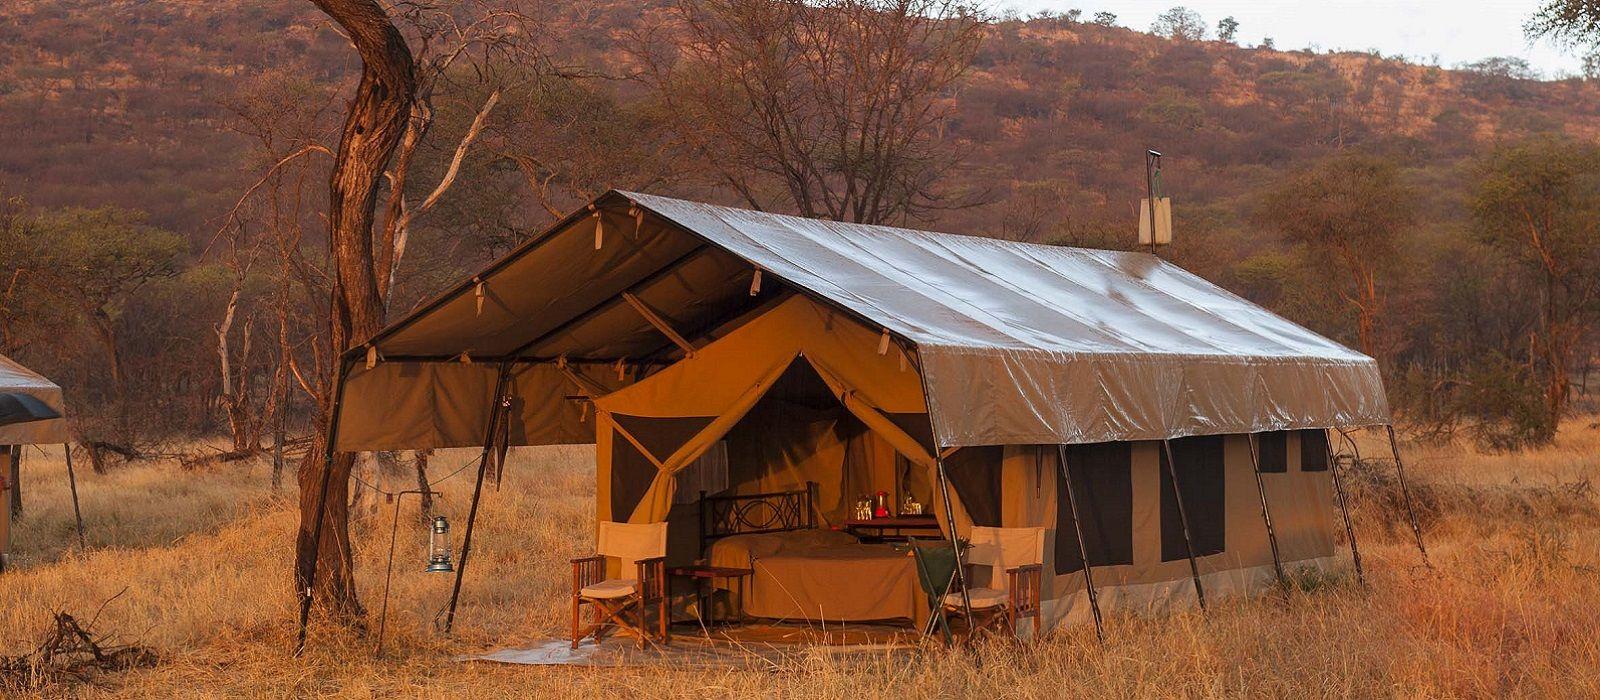 Hotel Ndutu Kati Kati Tented Camp Tanzania